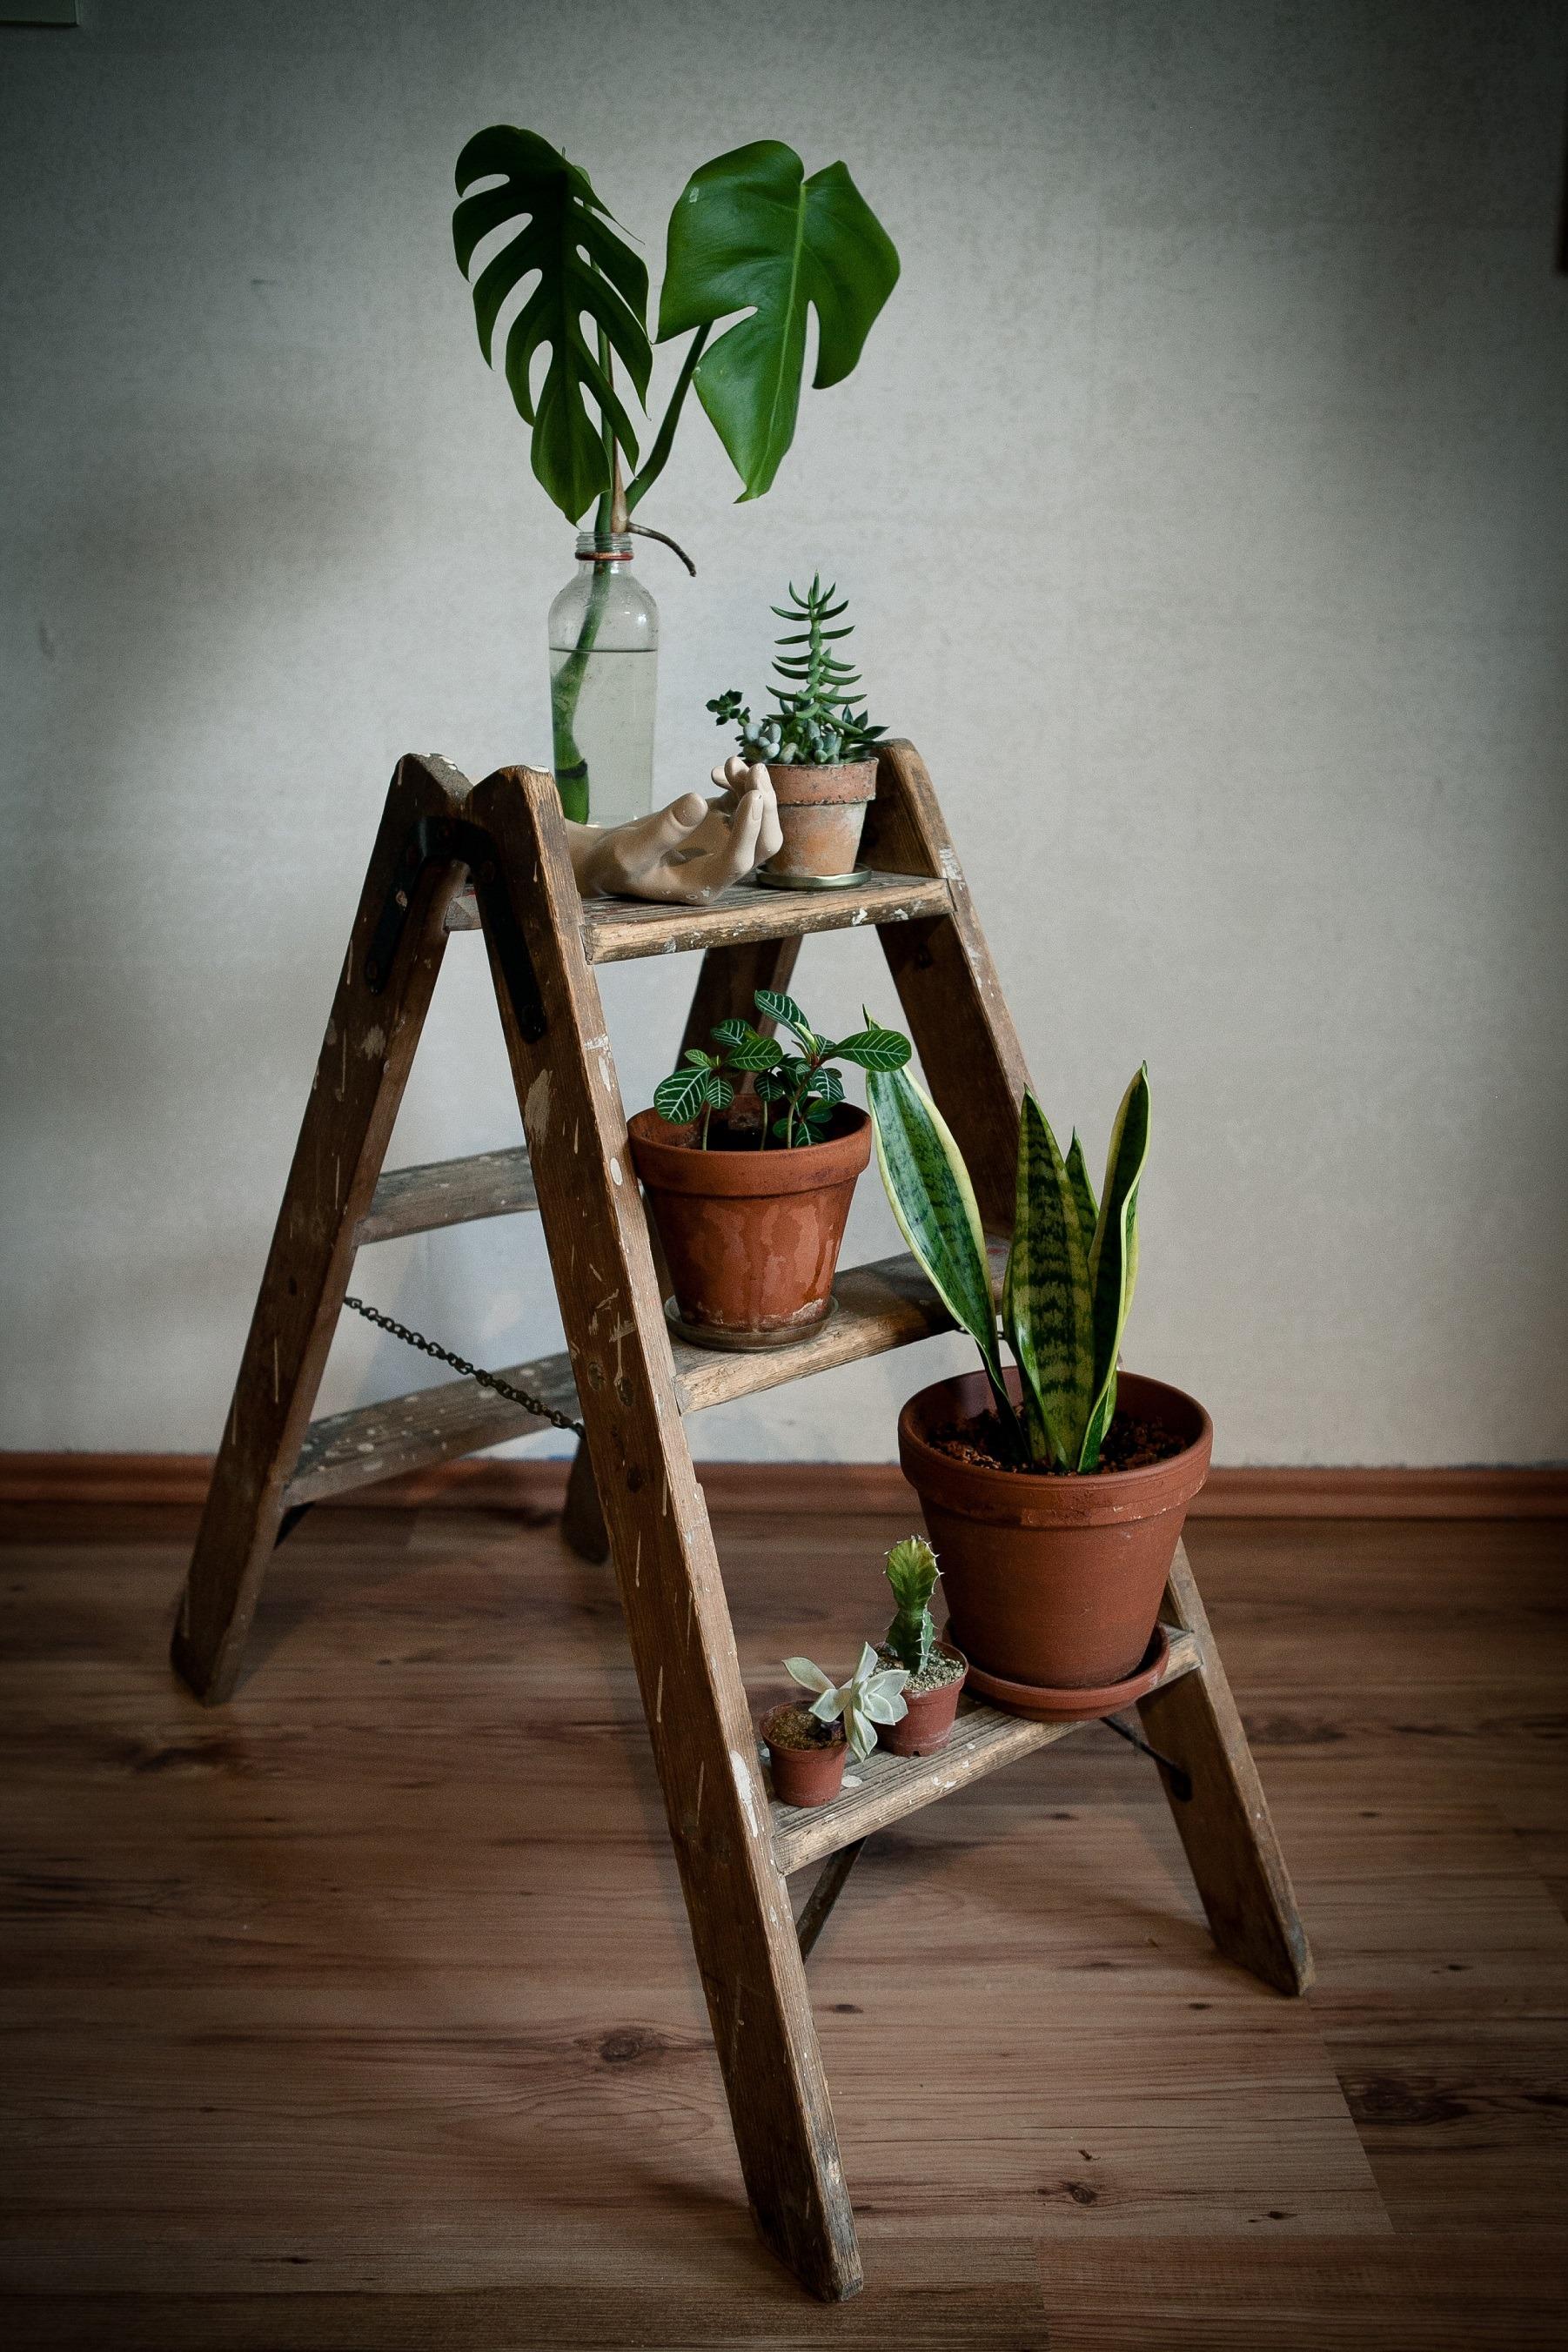 Vintage ladder with plants